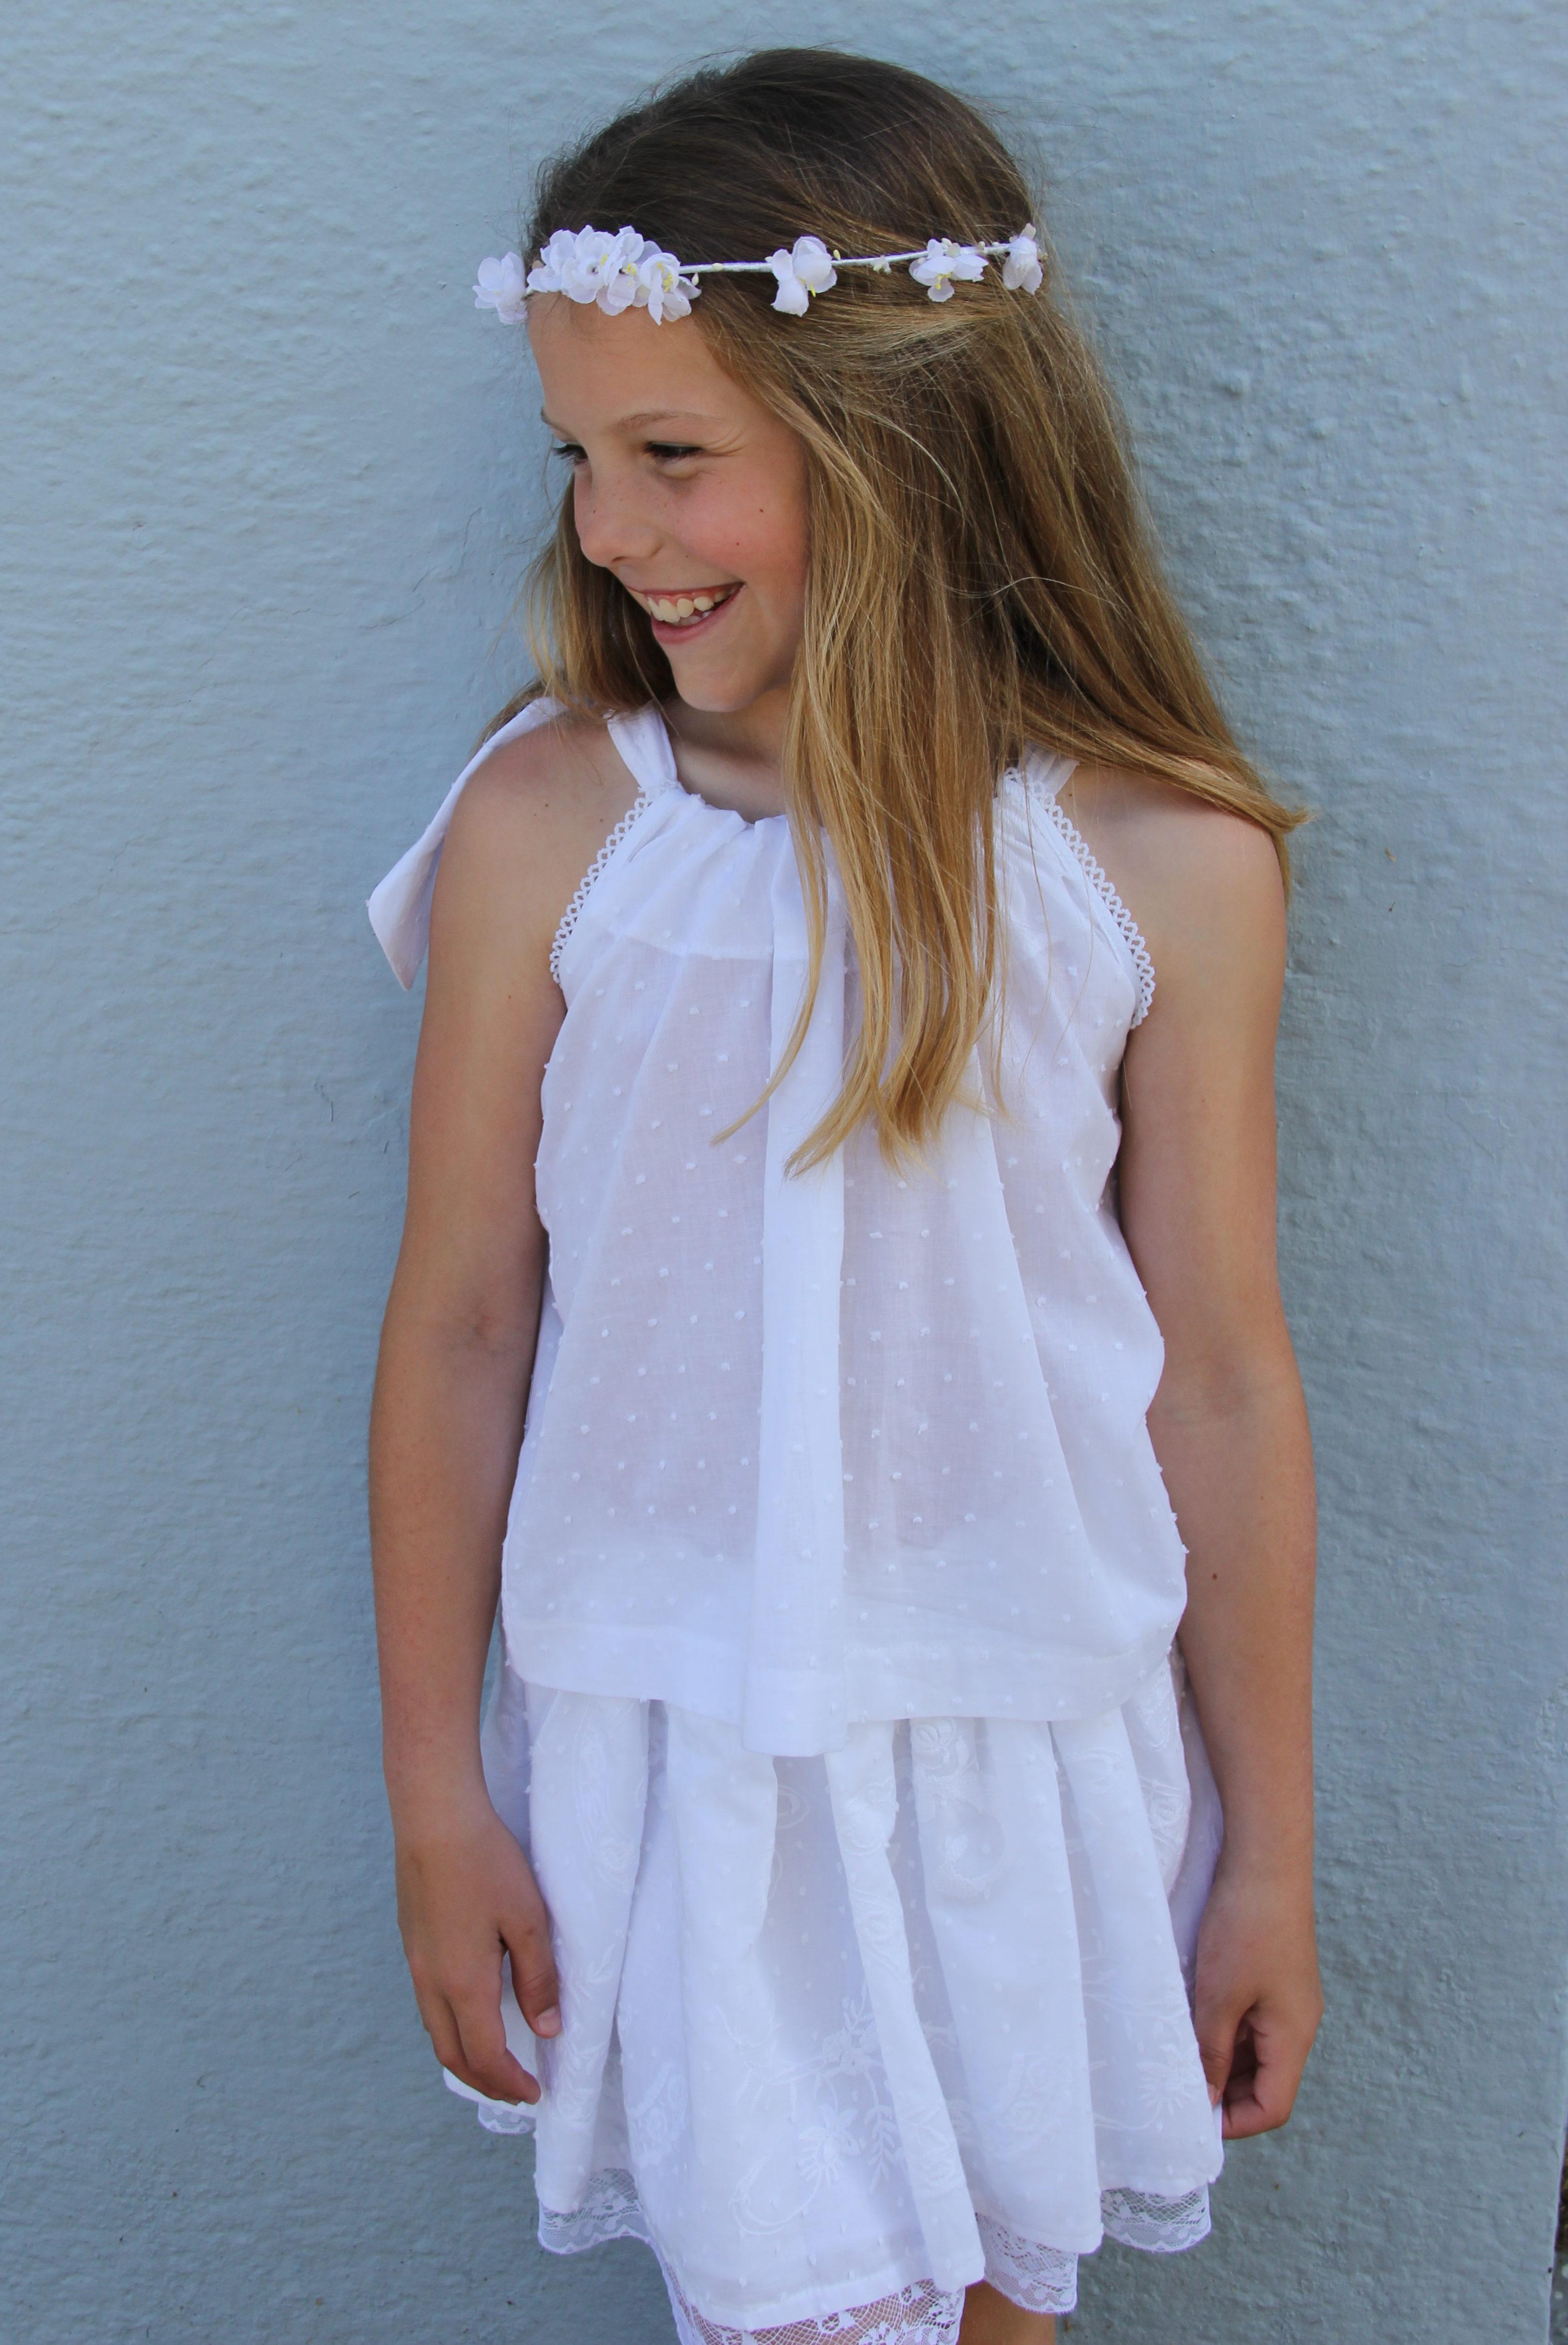 Falda ibicenca para niña, conjunto ibicenco para niña, falda de plumeti bordado, falda blanca niña online